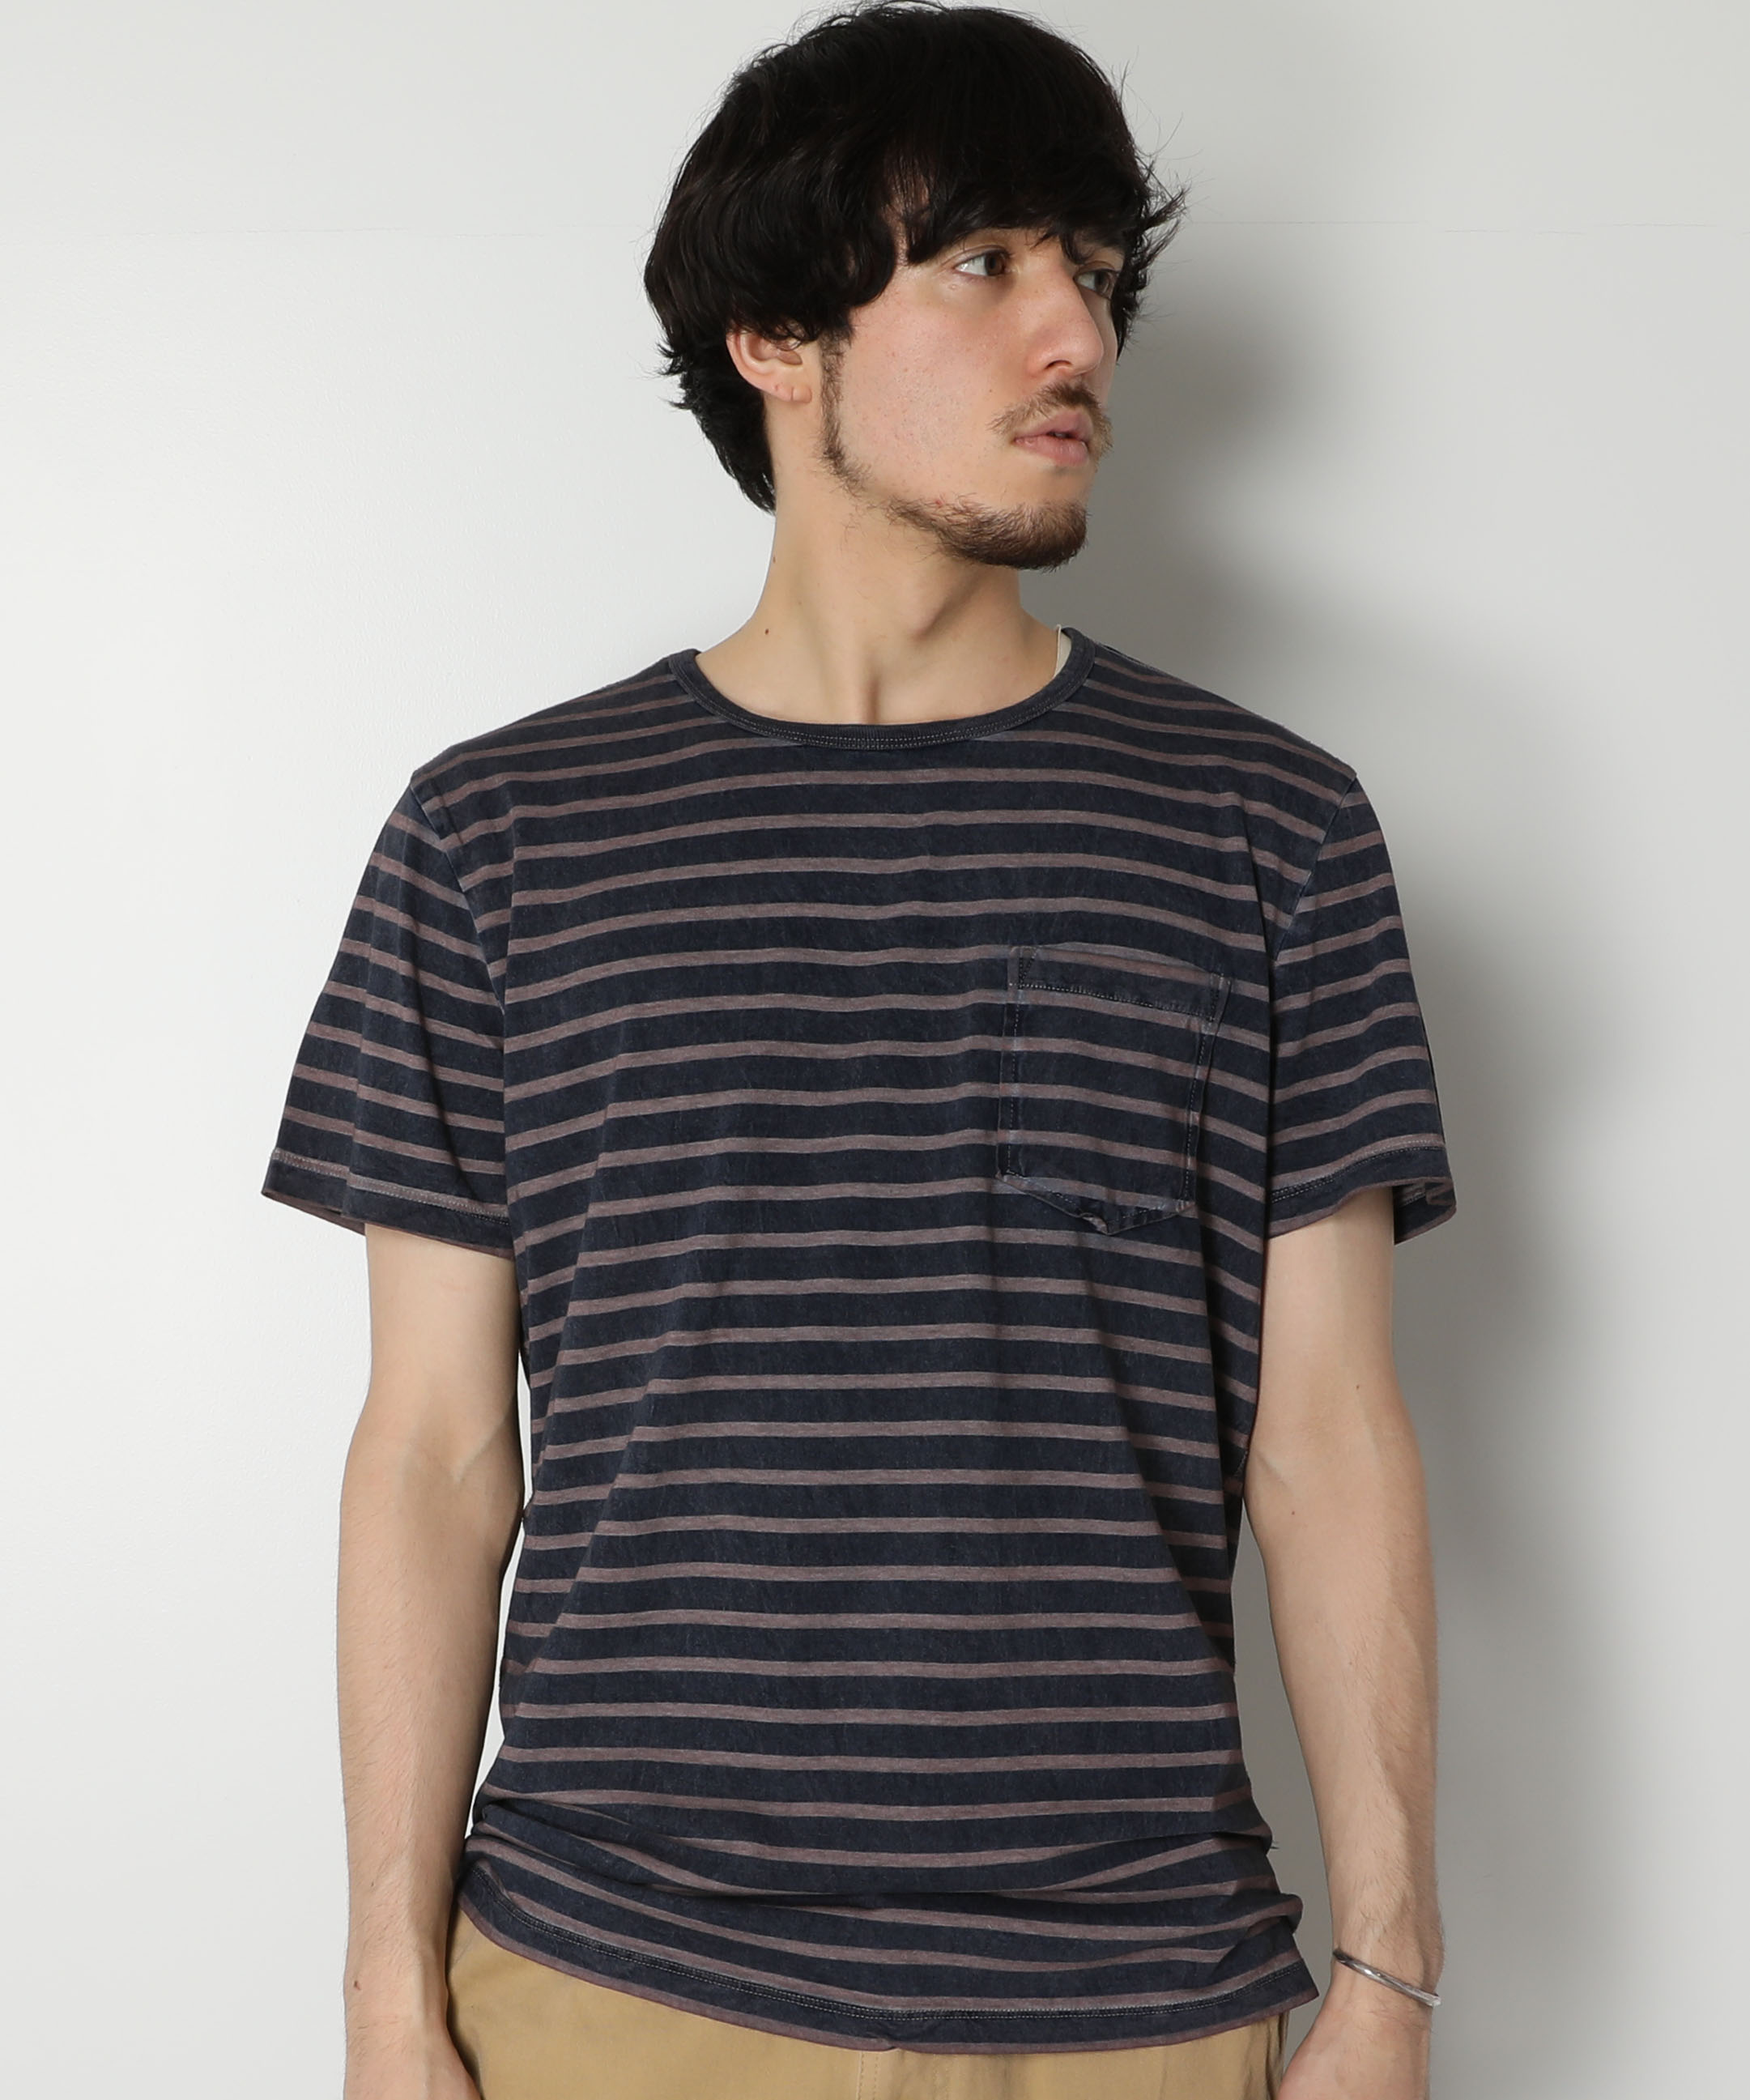 AR321 Stripe Pocket T-shirt/AR321 ボーダーポケットTシャツ